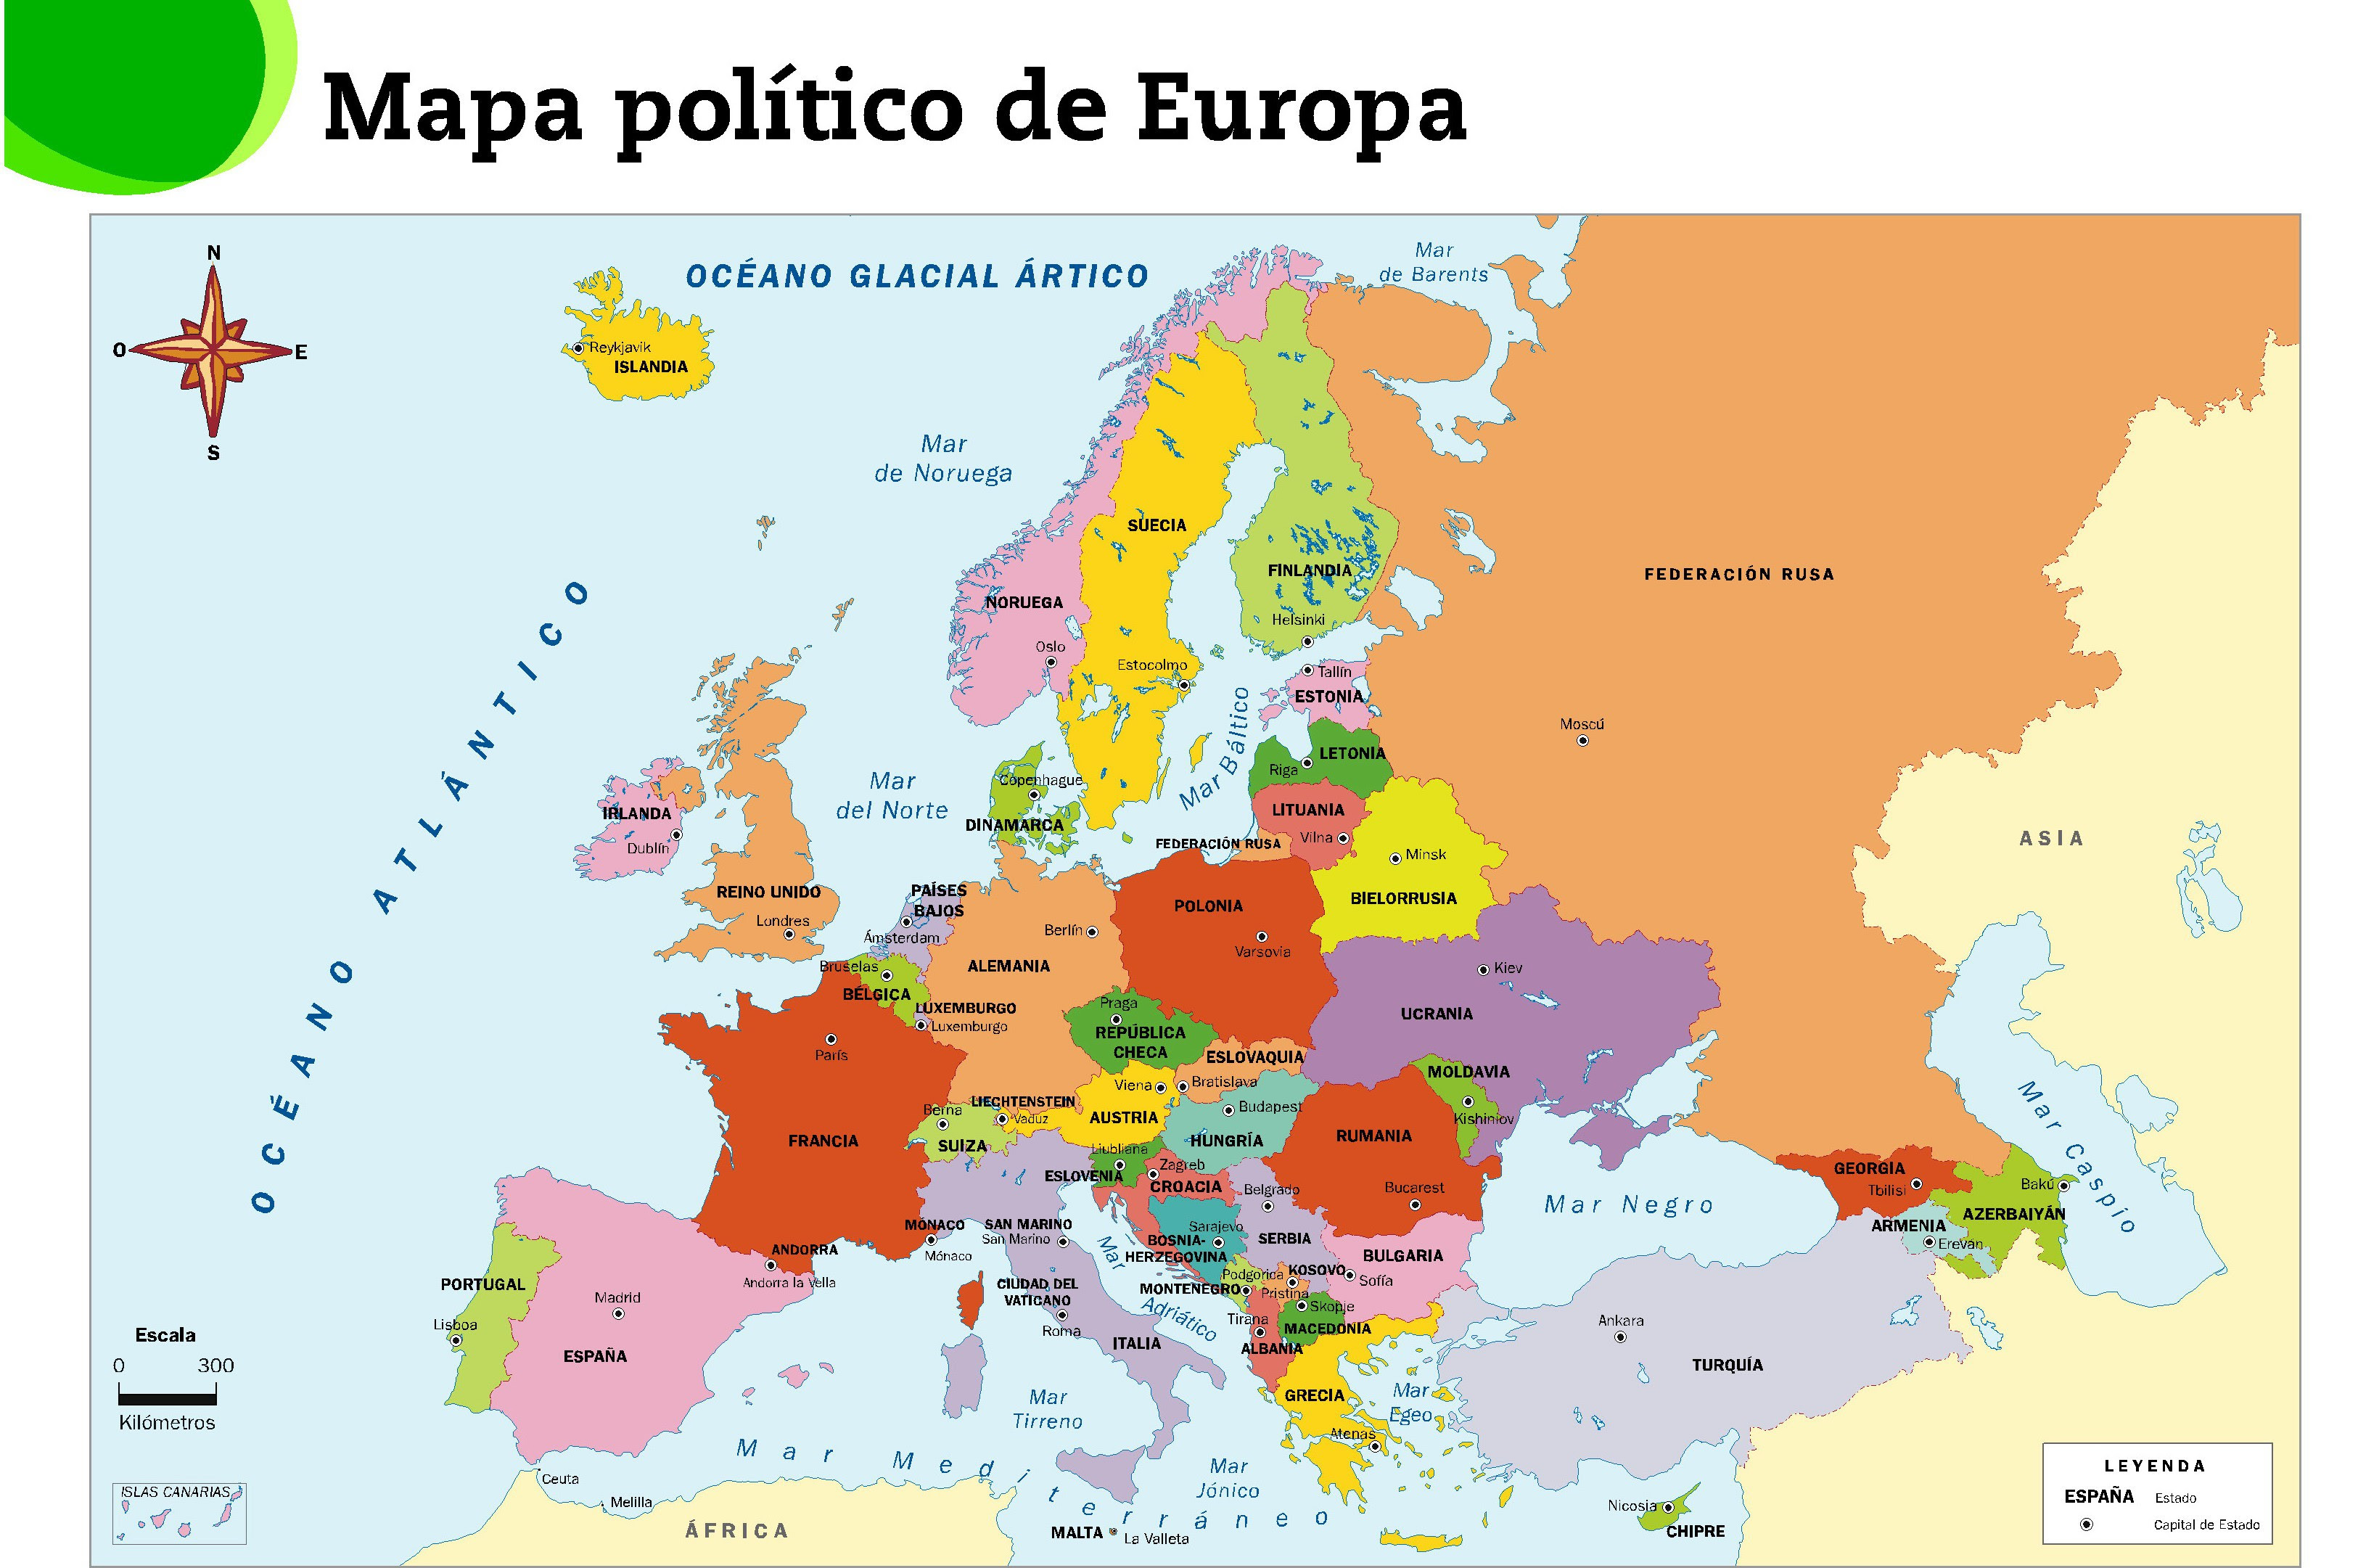 Mapa Actual De Europa Y Asia.25 Images Mapa De Europa